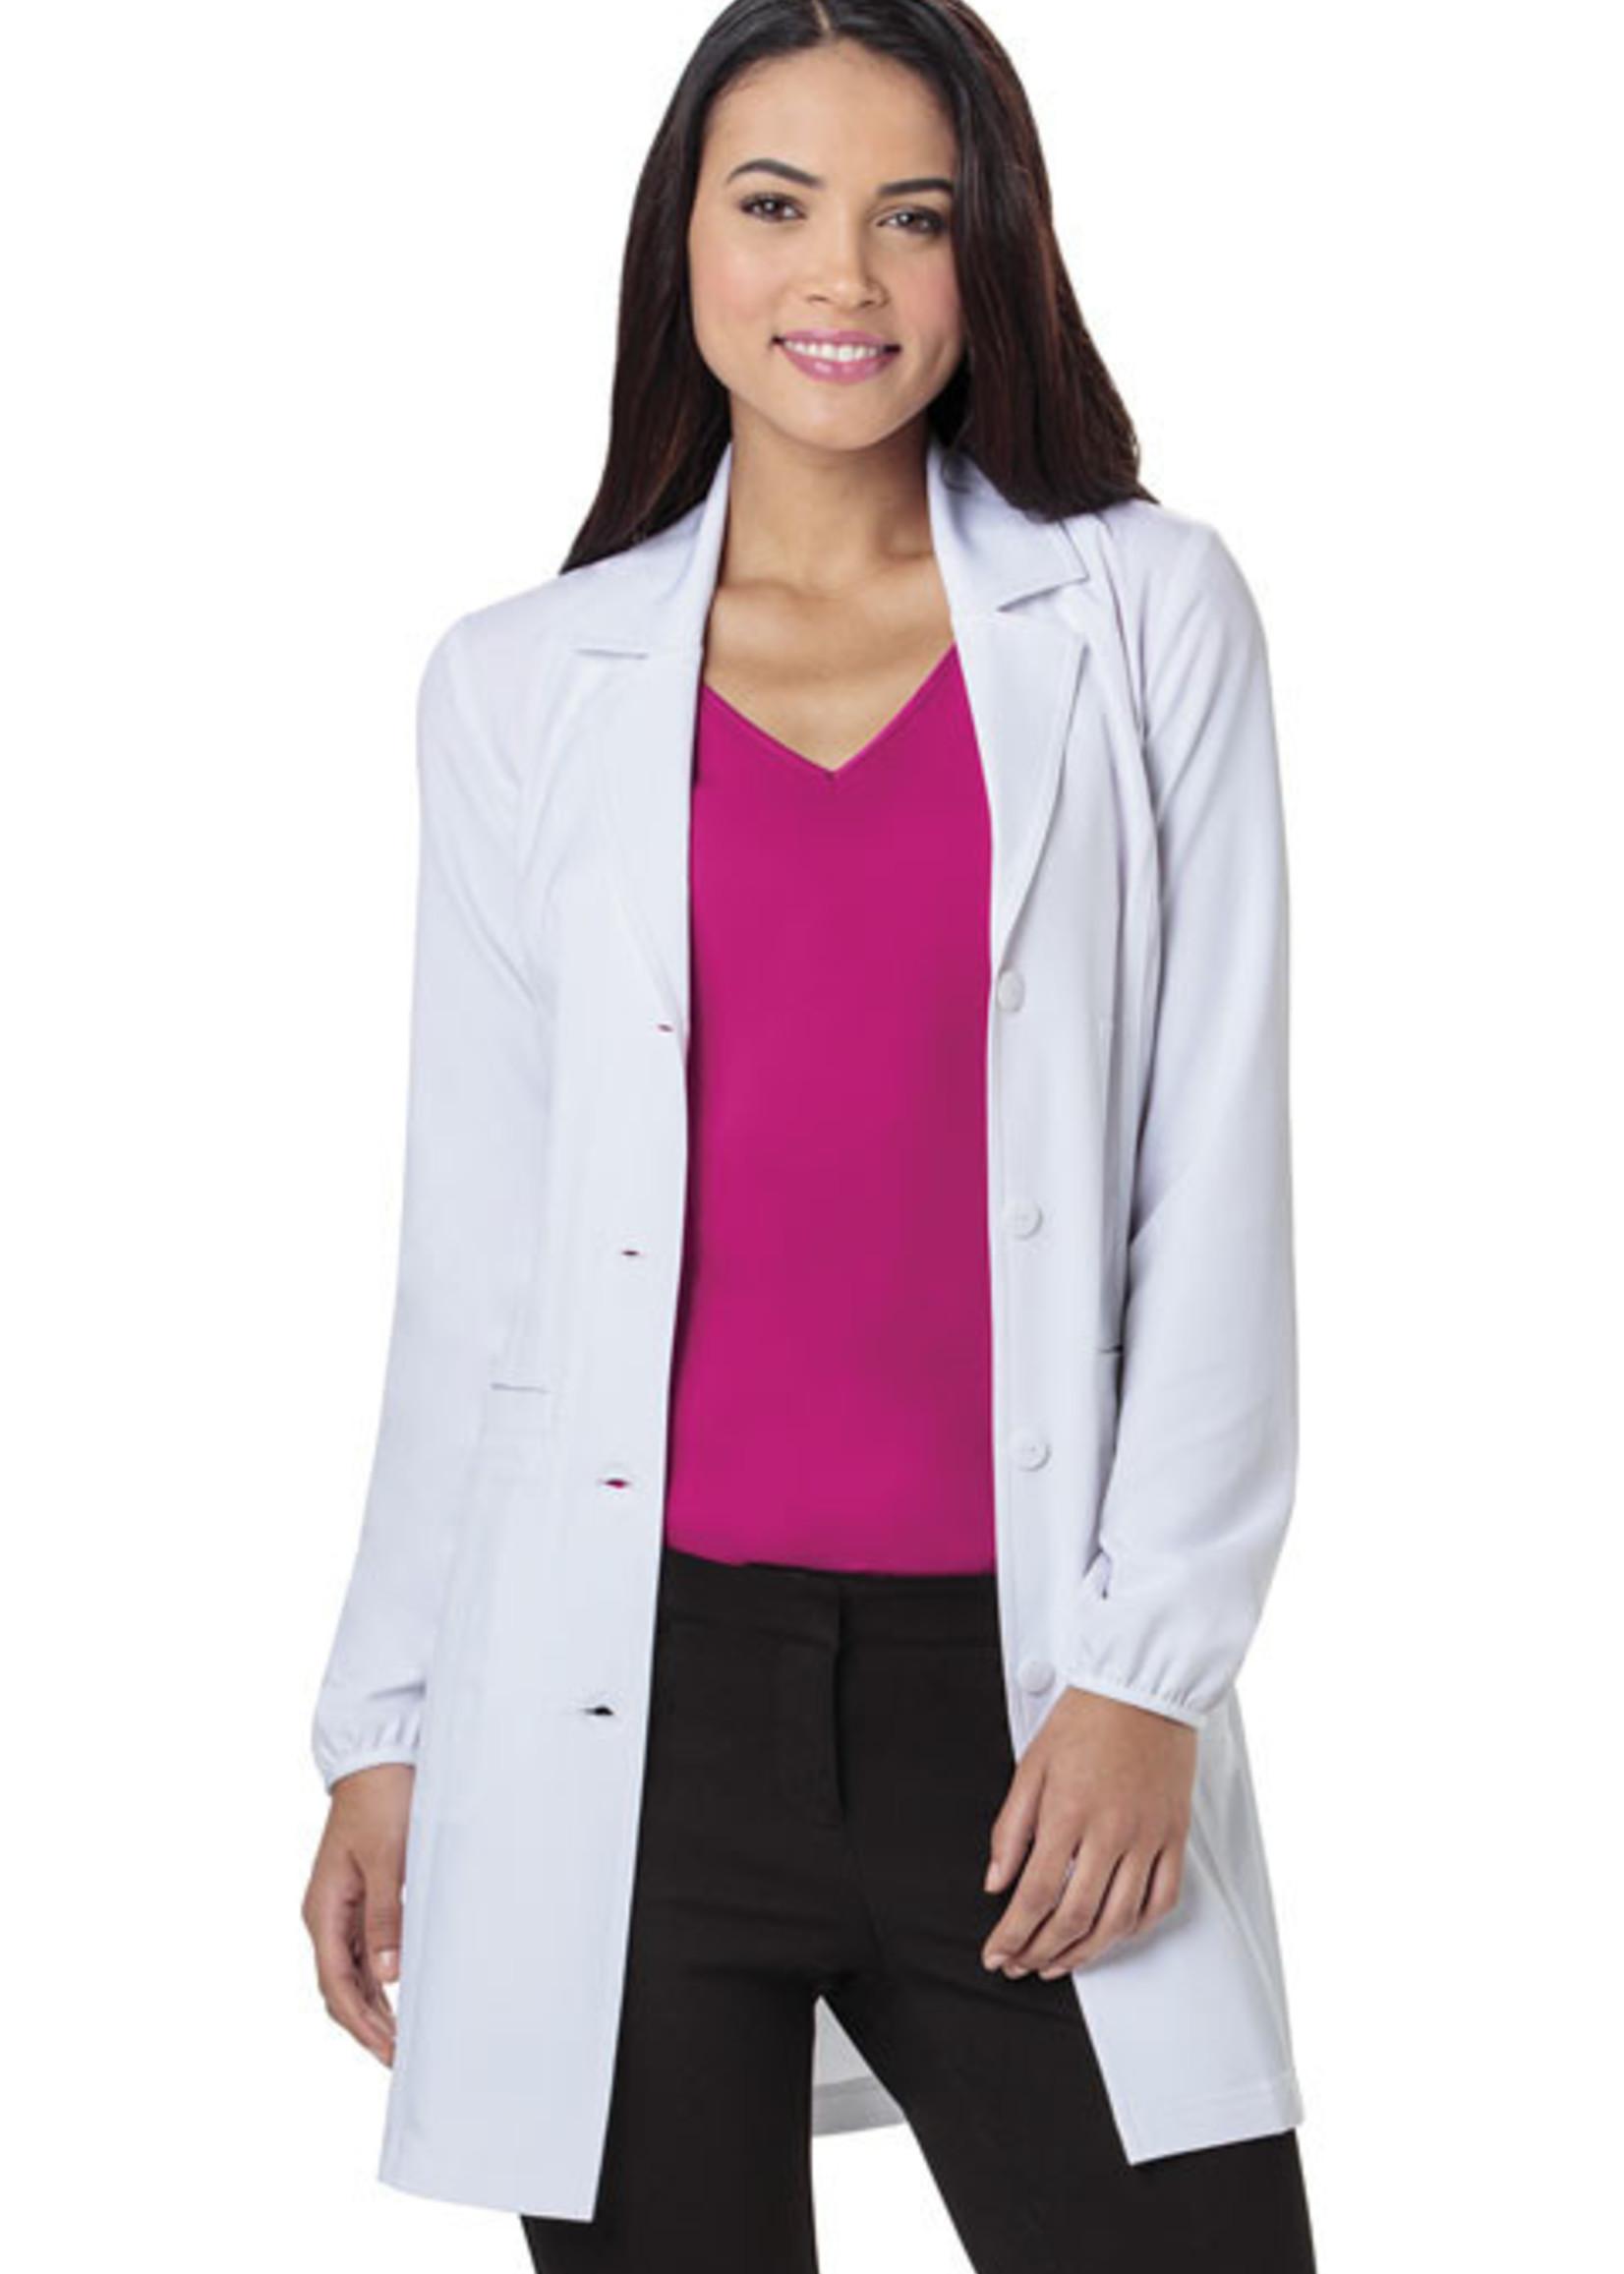 HeartSoul Lab Coat - HeartSoul Lab Coat 20402